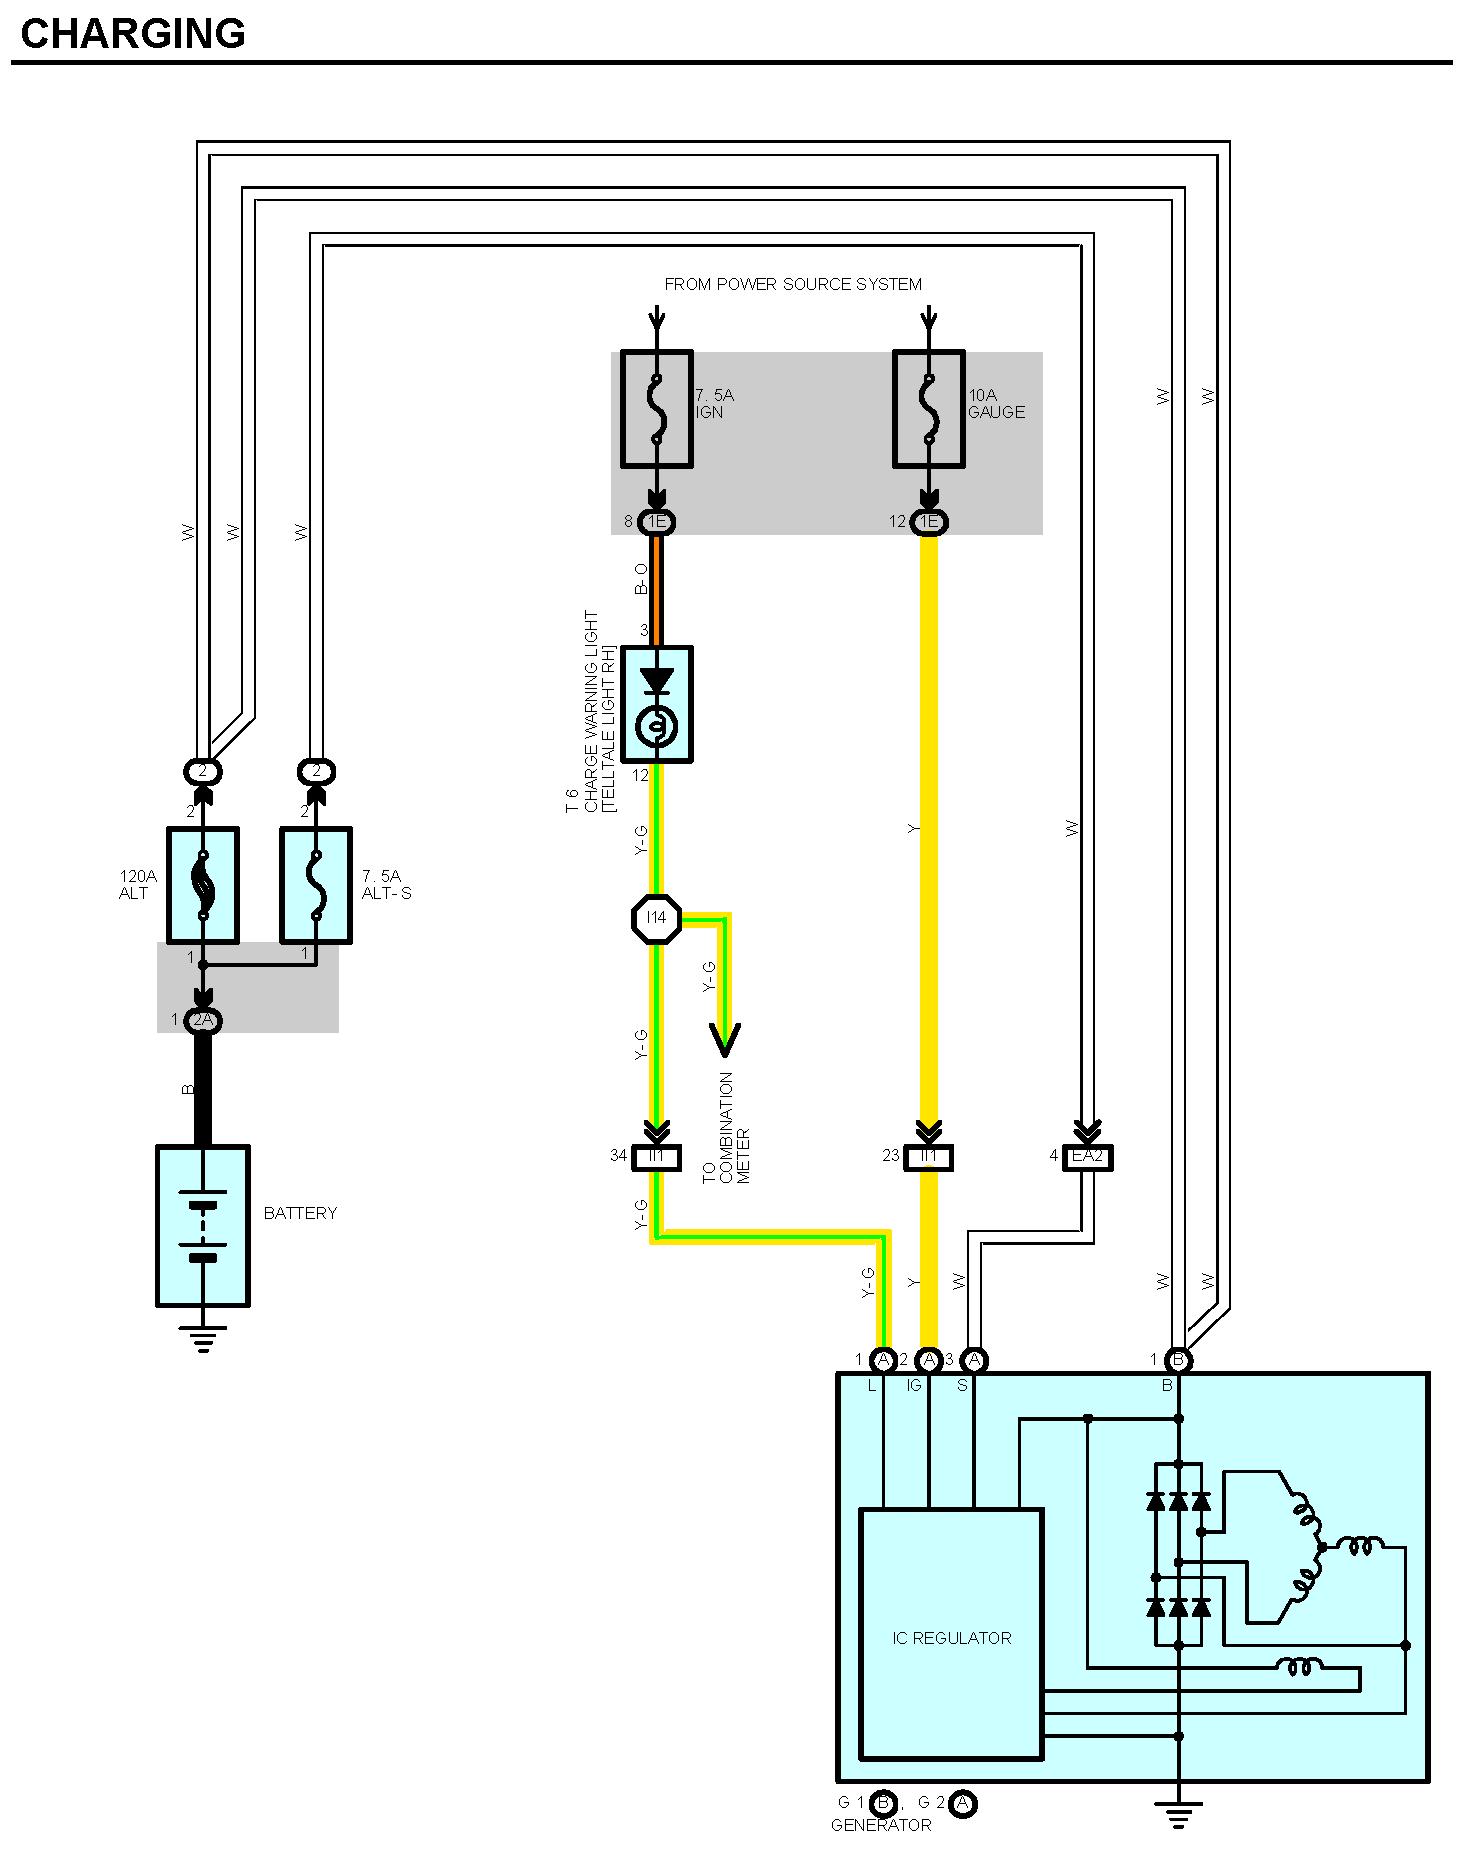 Toyota Alternator Wiring Diagram : toyota, alternator, wiring, diagram, Wilbo666, Toyota, Alternators